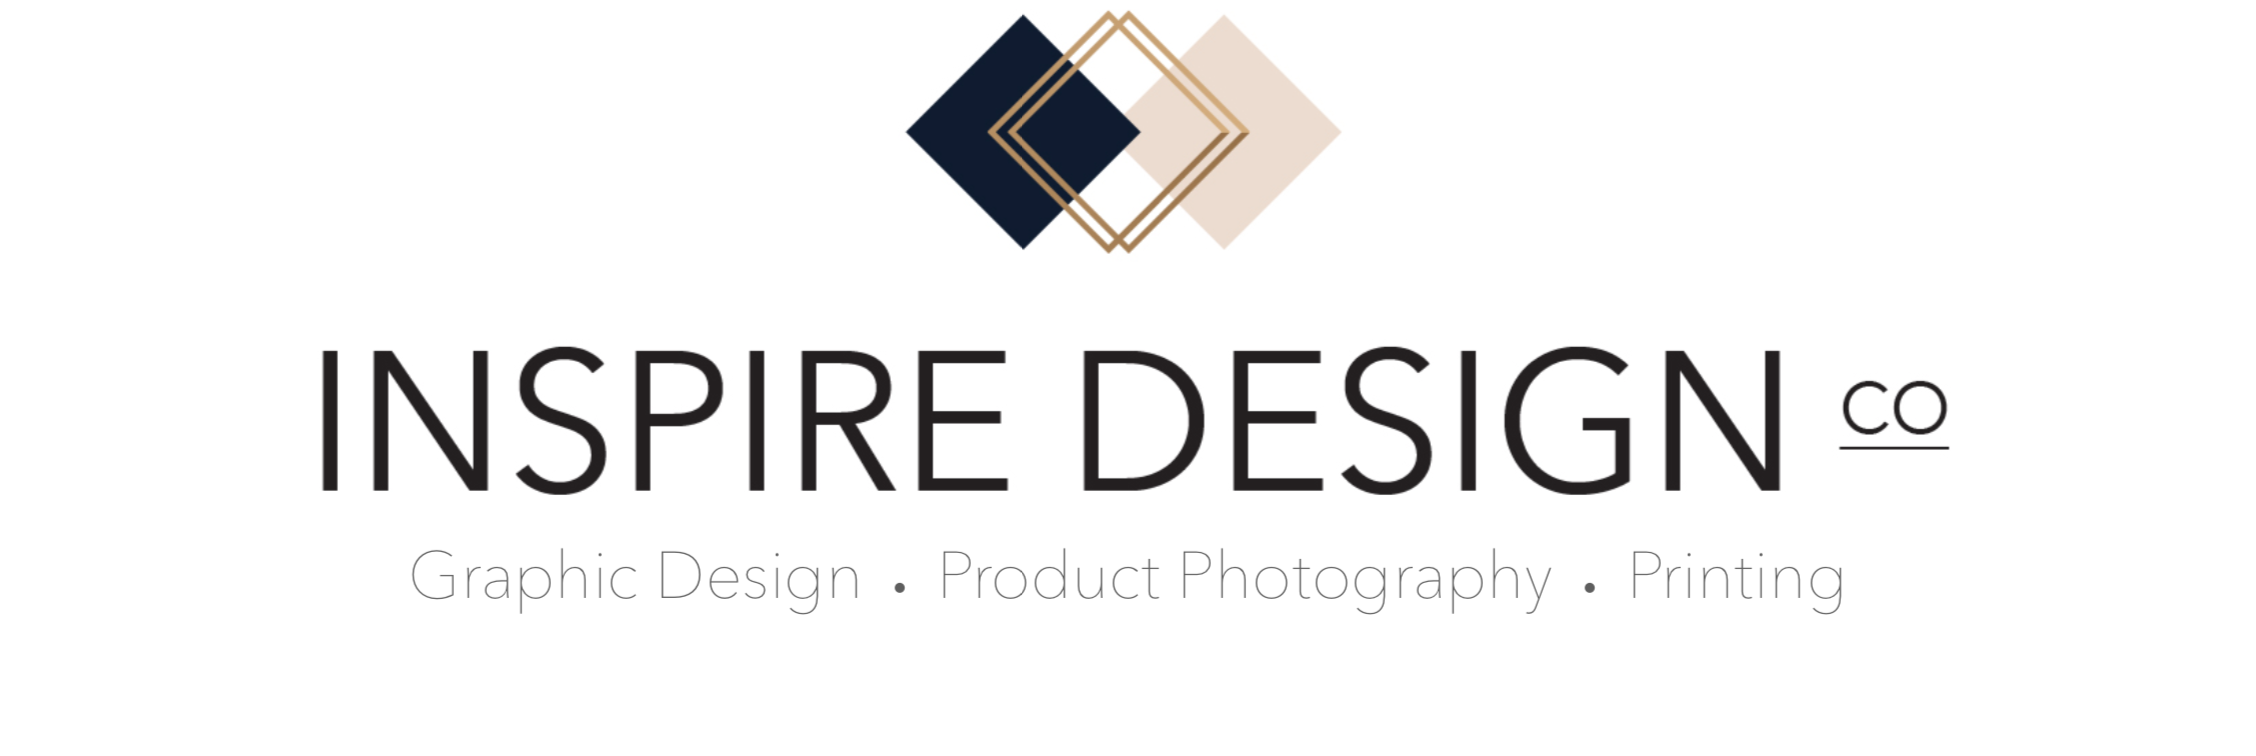 Inspire Design Co.